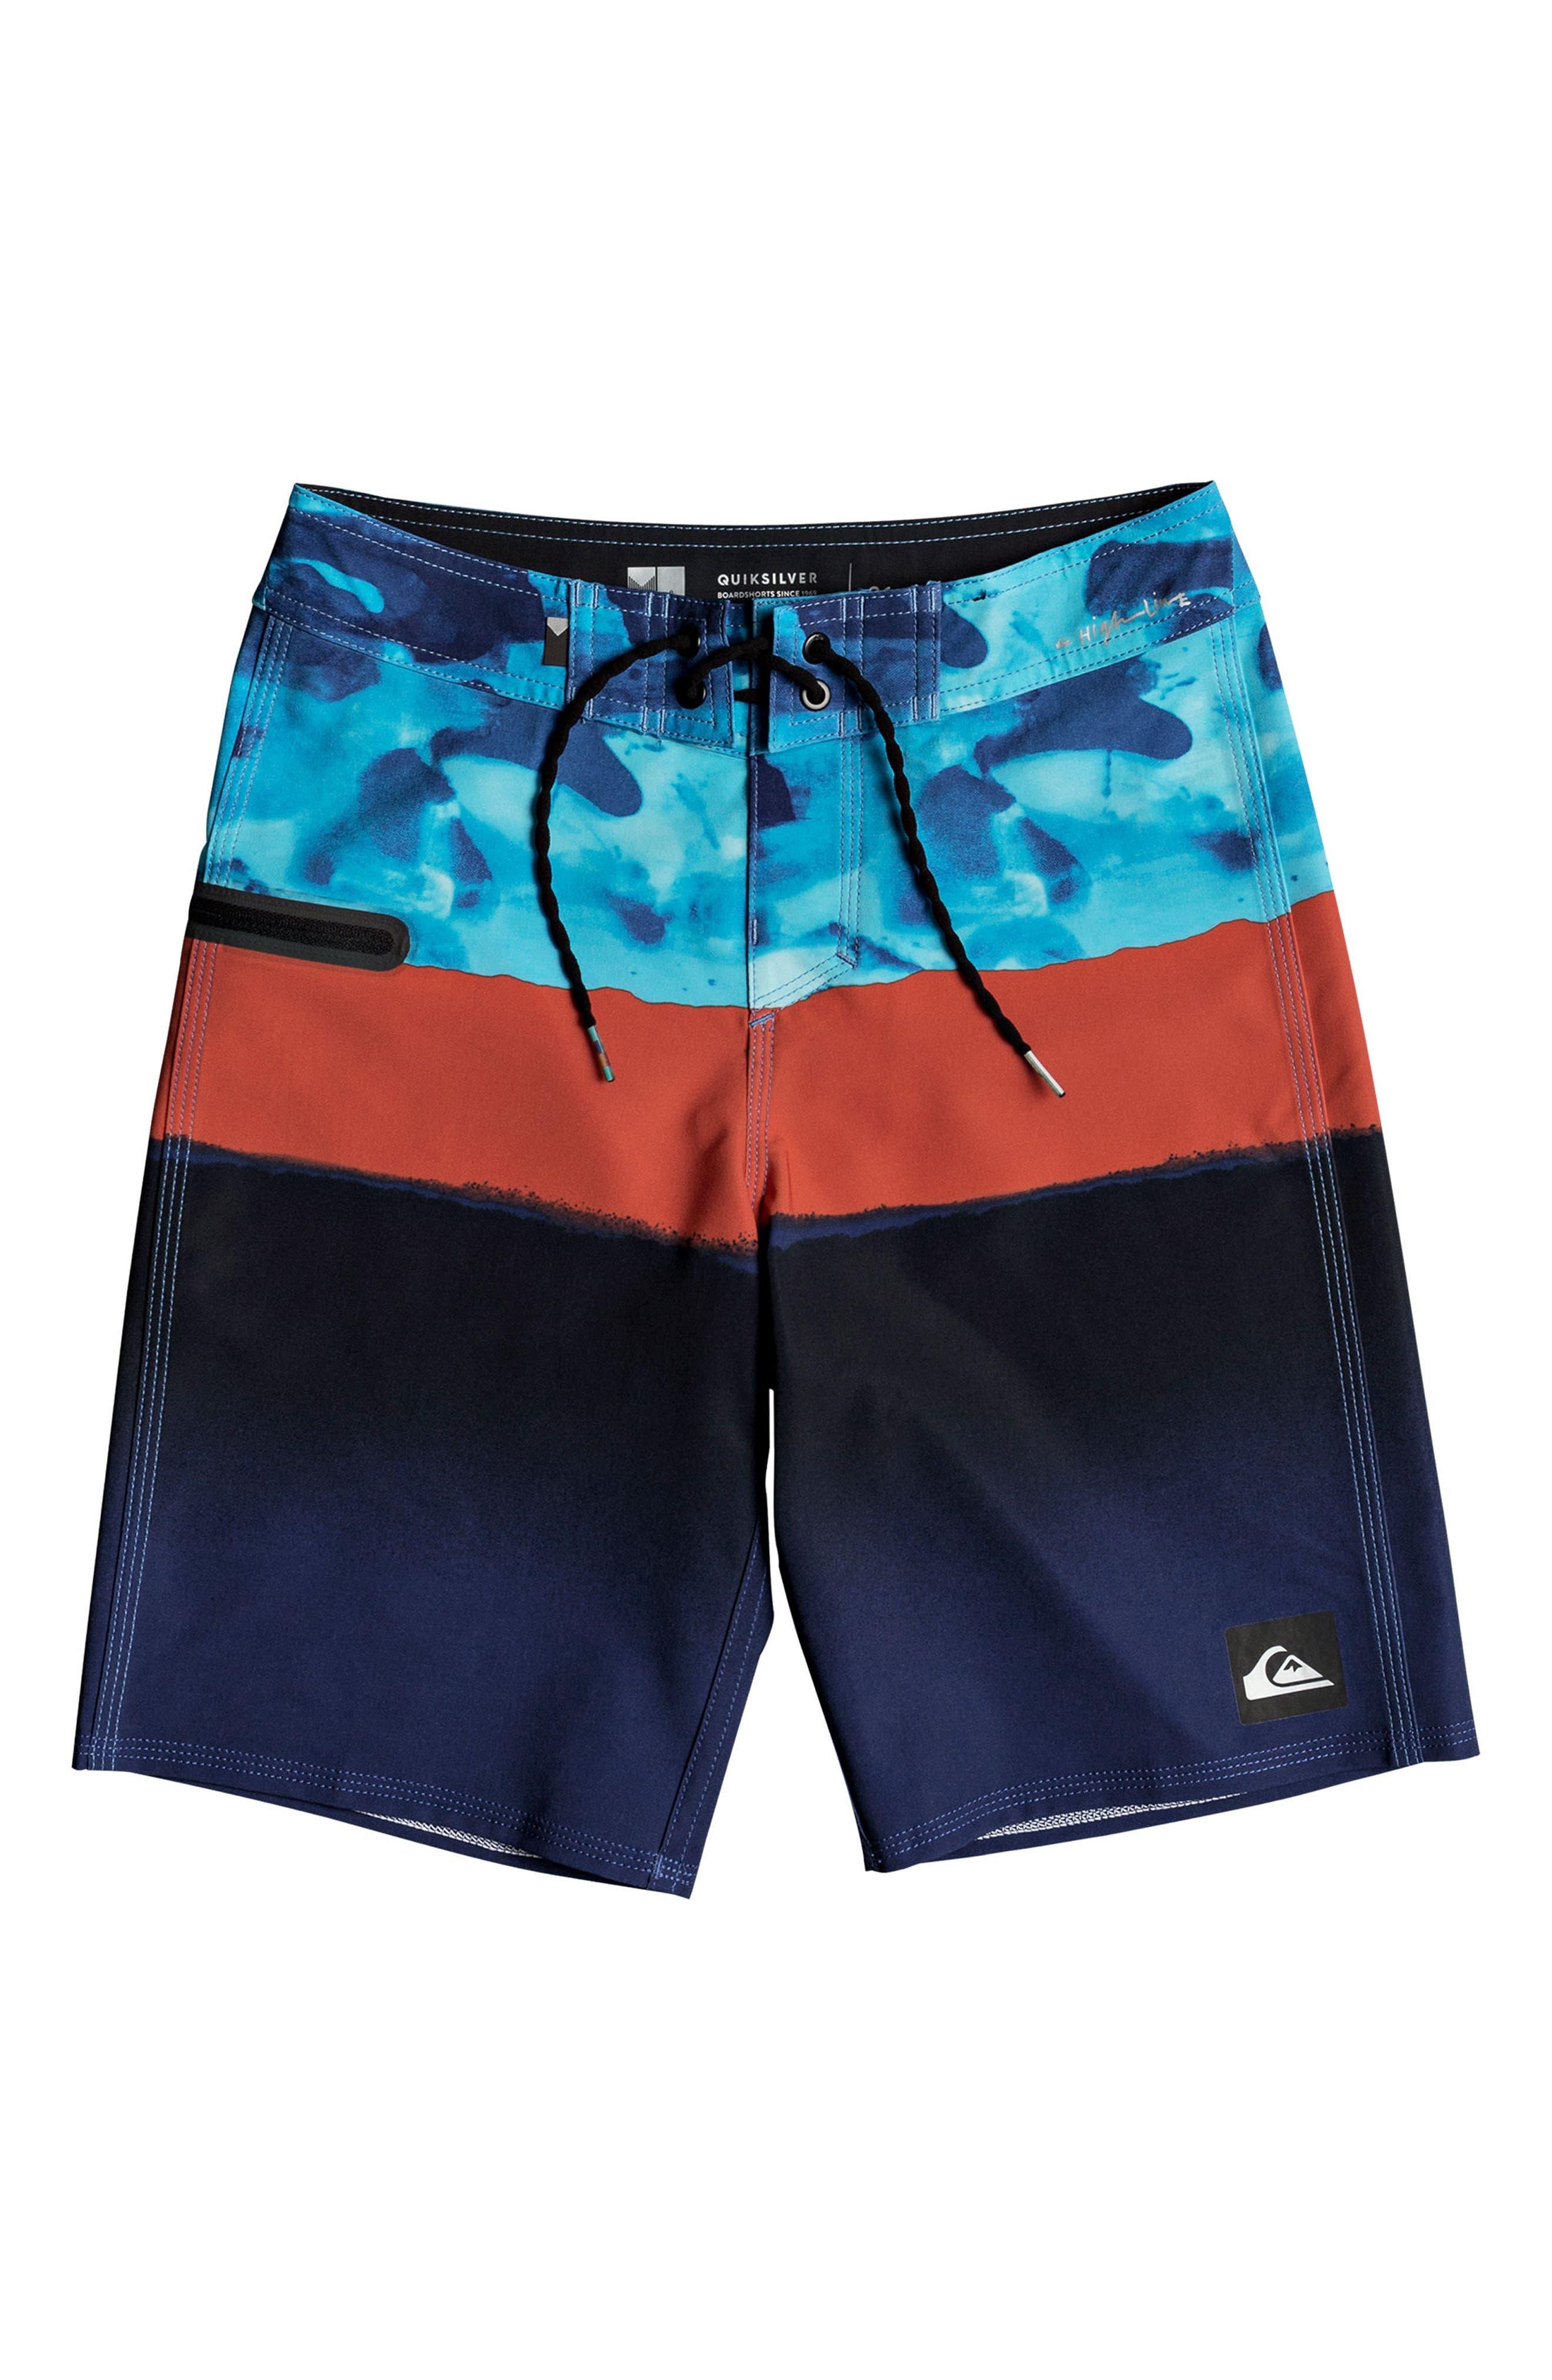 Alternate Image 1 Selected - Quiksilver Blocked Resin Camo Board Shorts (Big Boys)